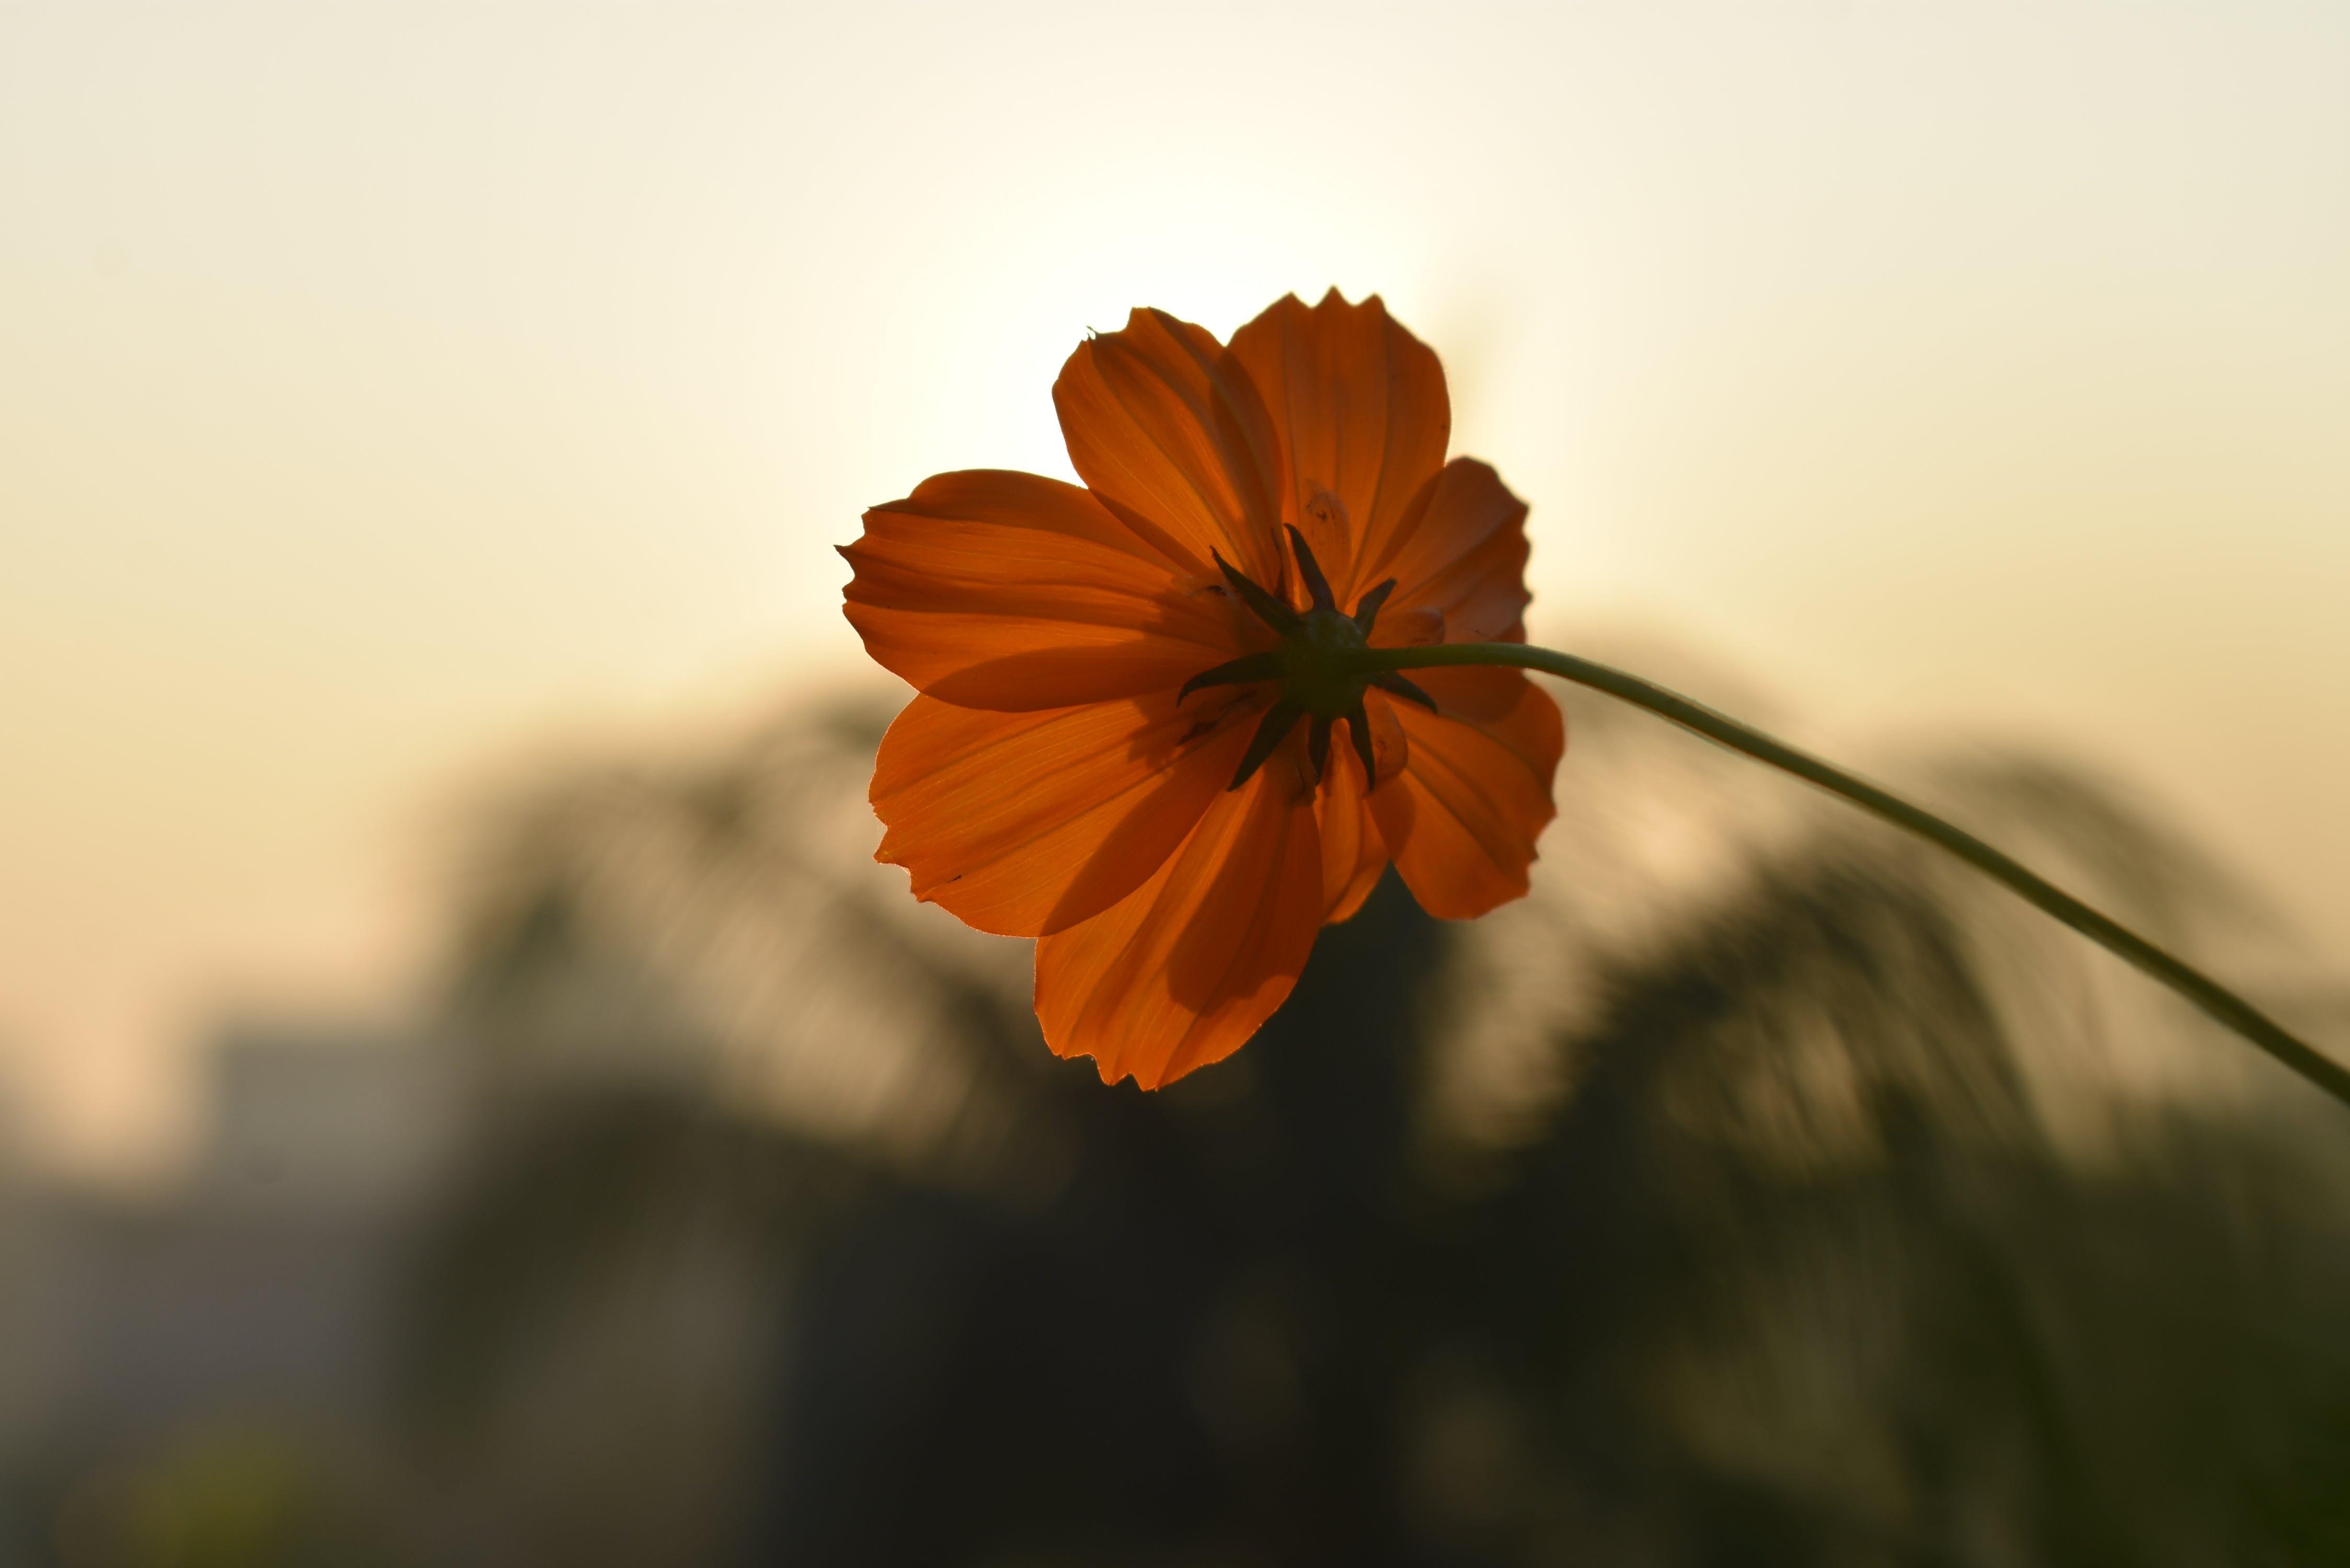 Selective Focus Photo of Orange Cosmos Flower in Bloom